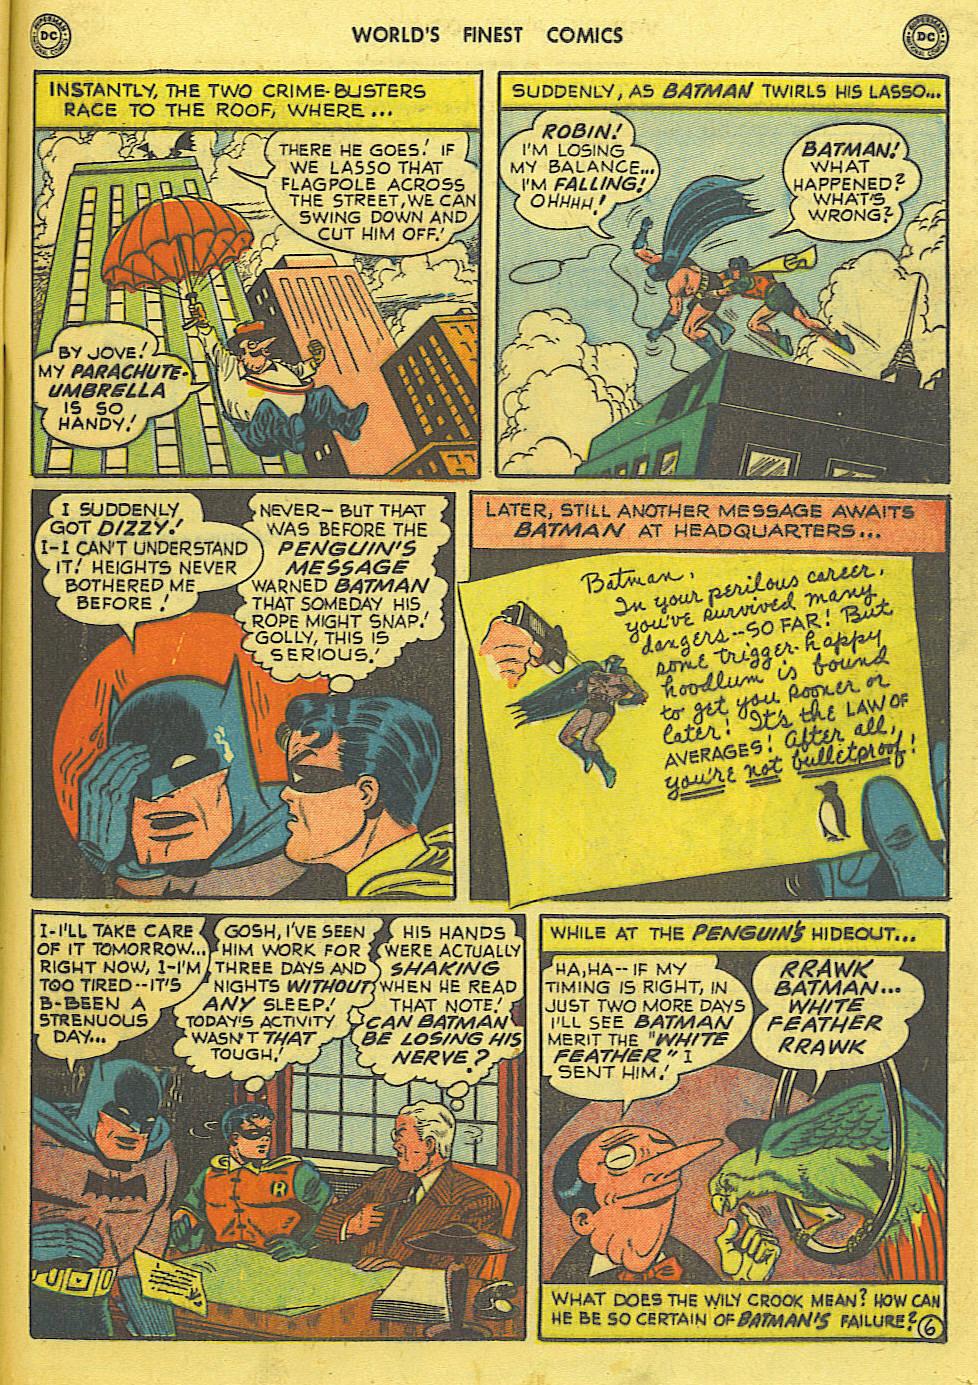 Read online World's Finest Comics comic -  Issue #49 - 68